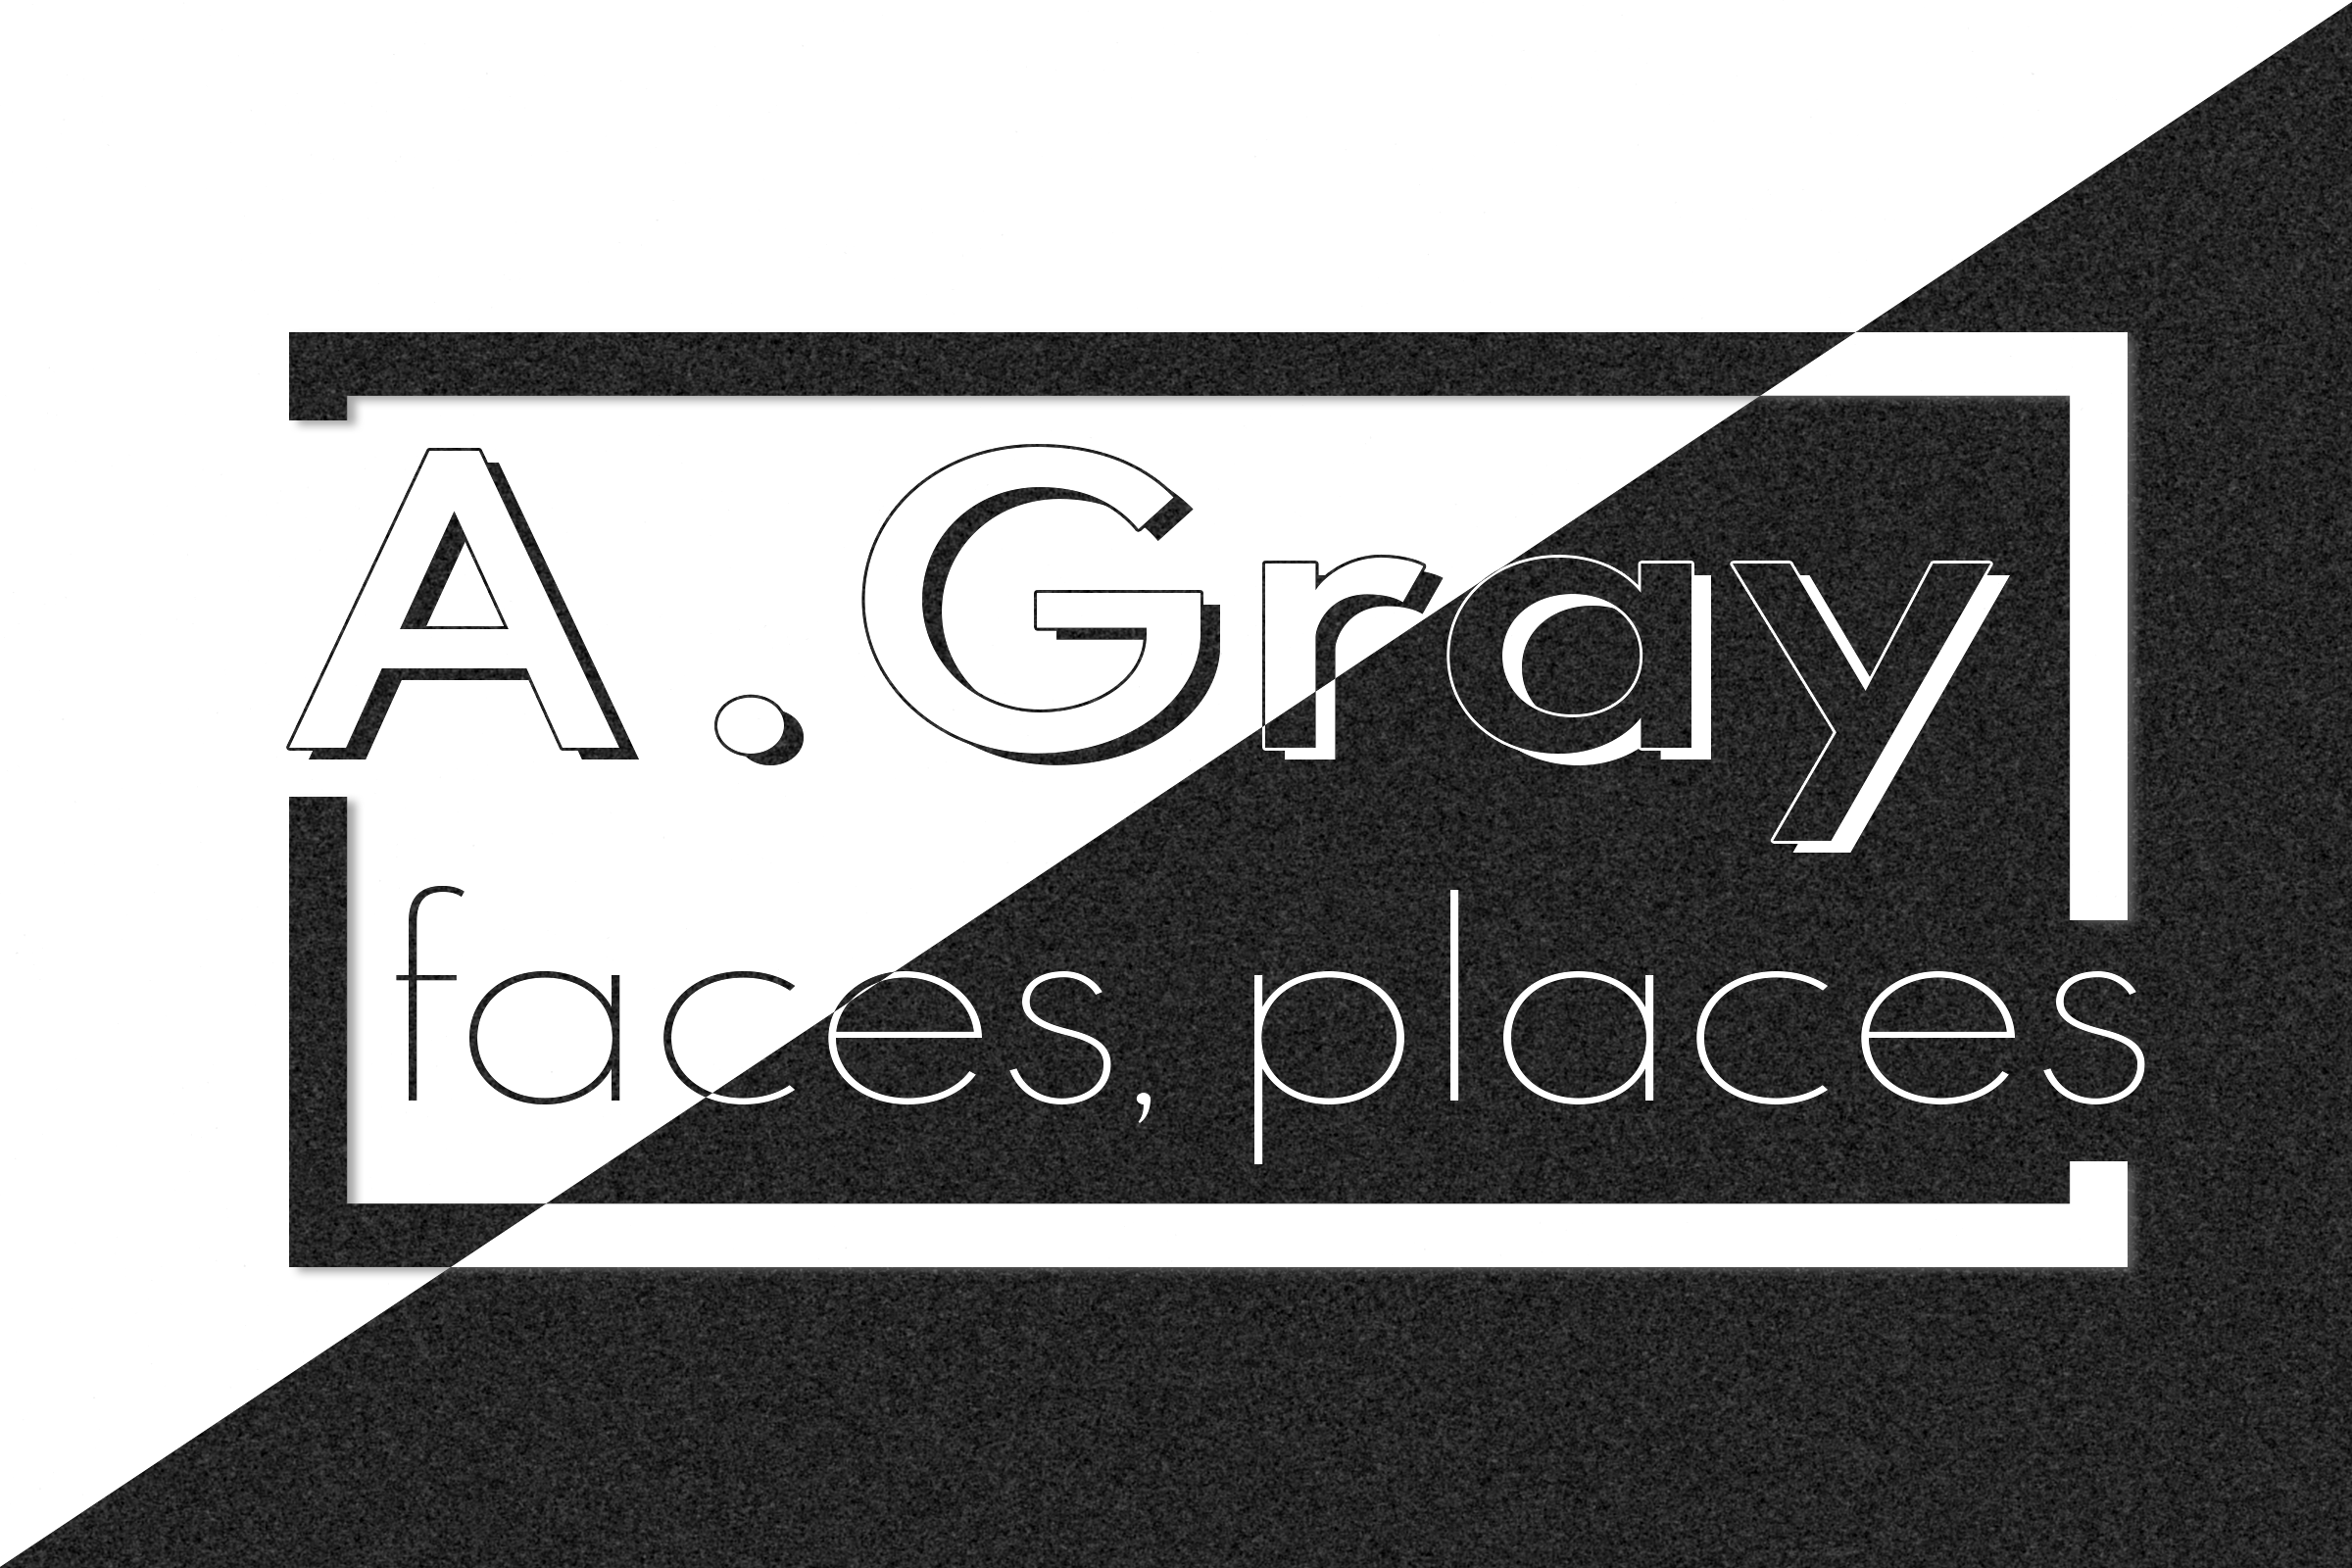 Alexis Gray